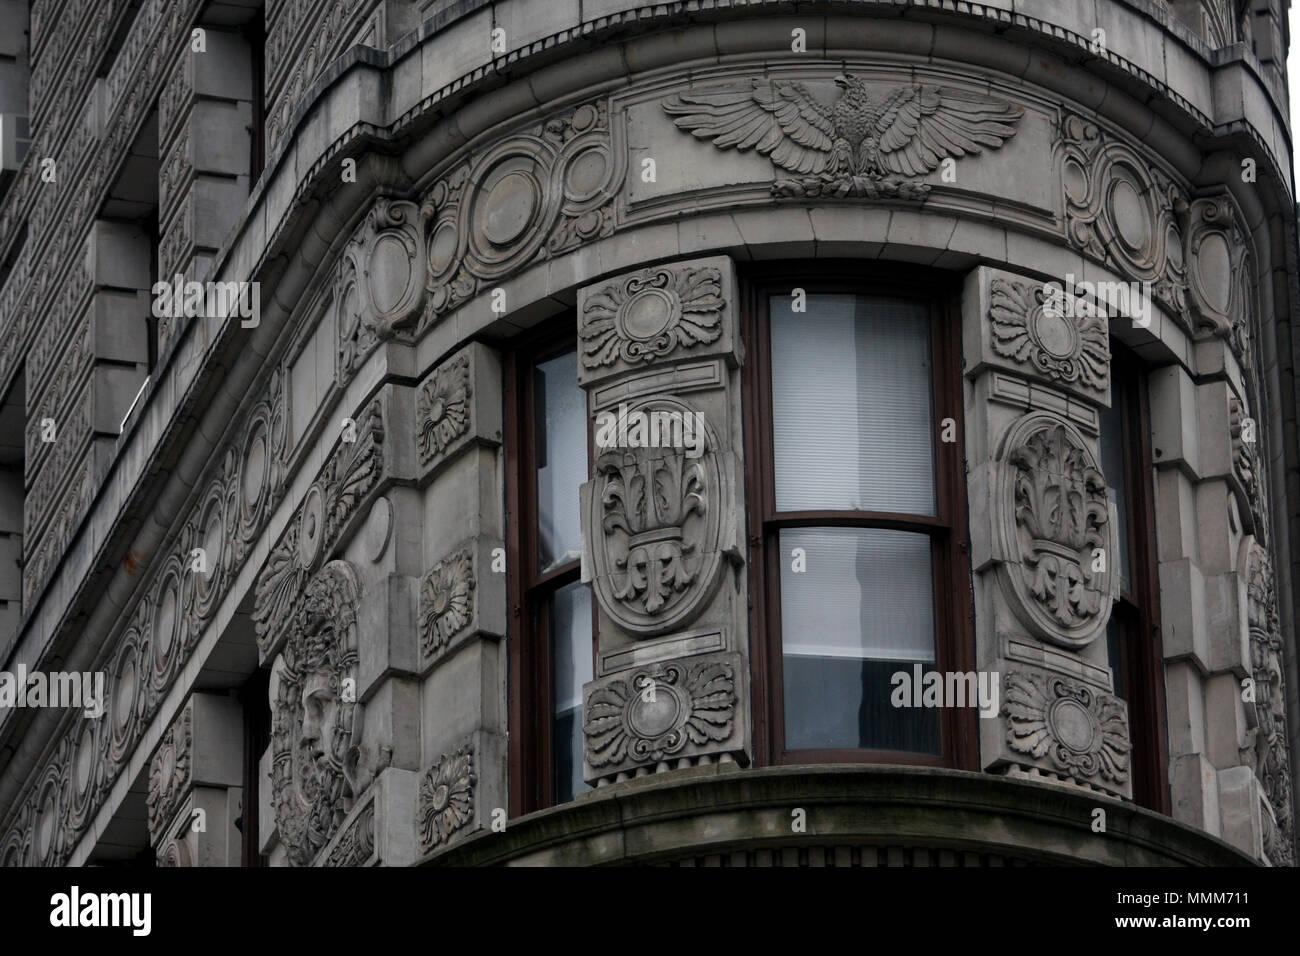 The Flatiron building near Madison Square Park and Flatiron District in Manhattan, New York City - Stock Image